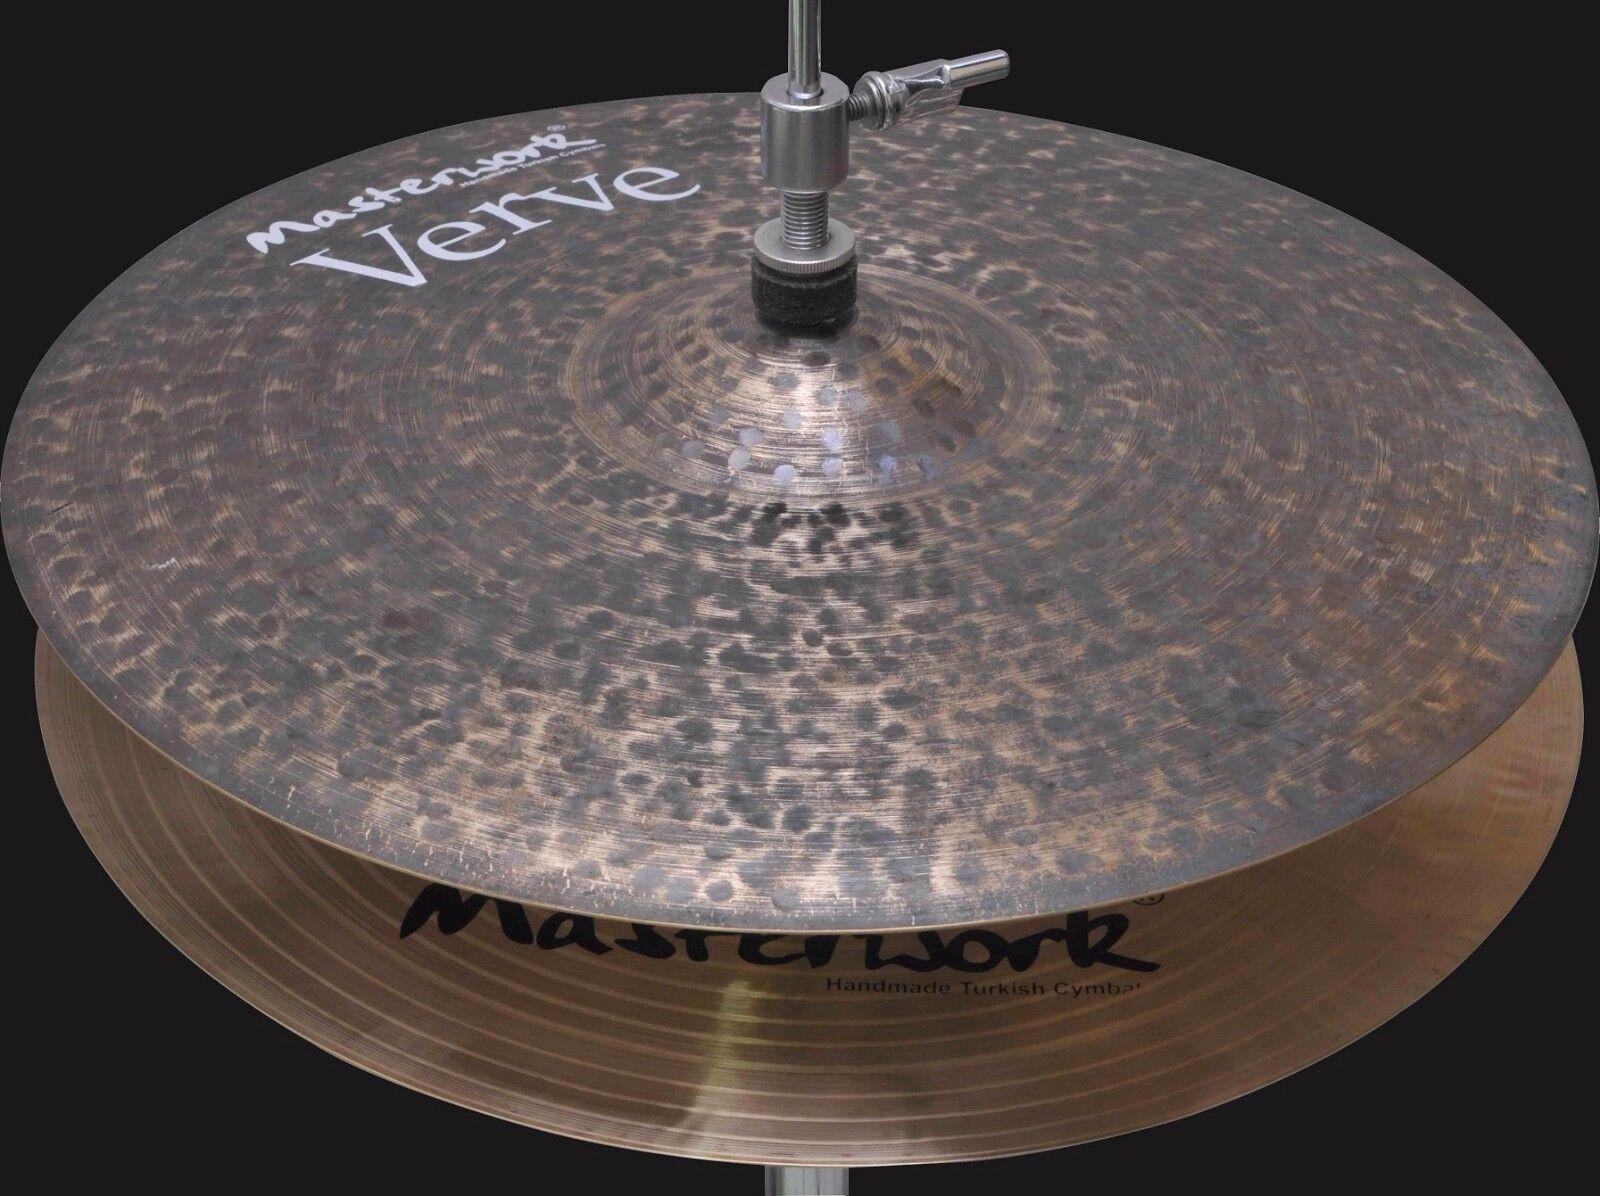 Masterwork Cymbals Verve Series 15-inch Verve Hi-Hat Light Cymbals